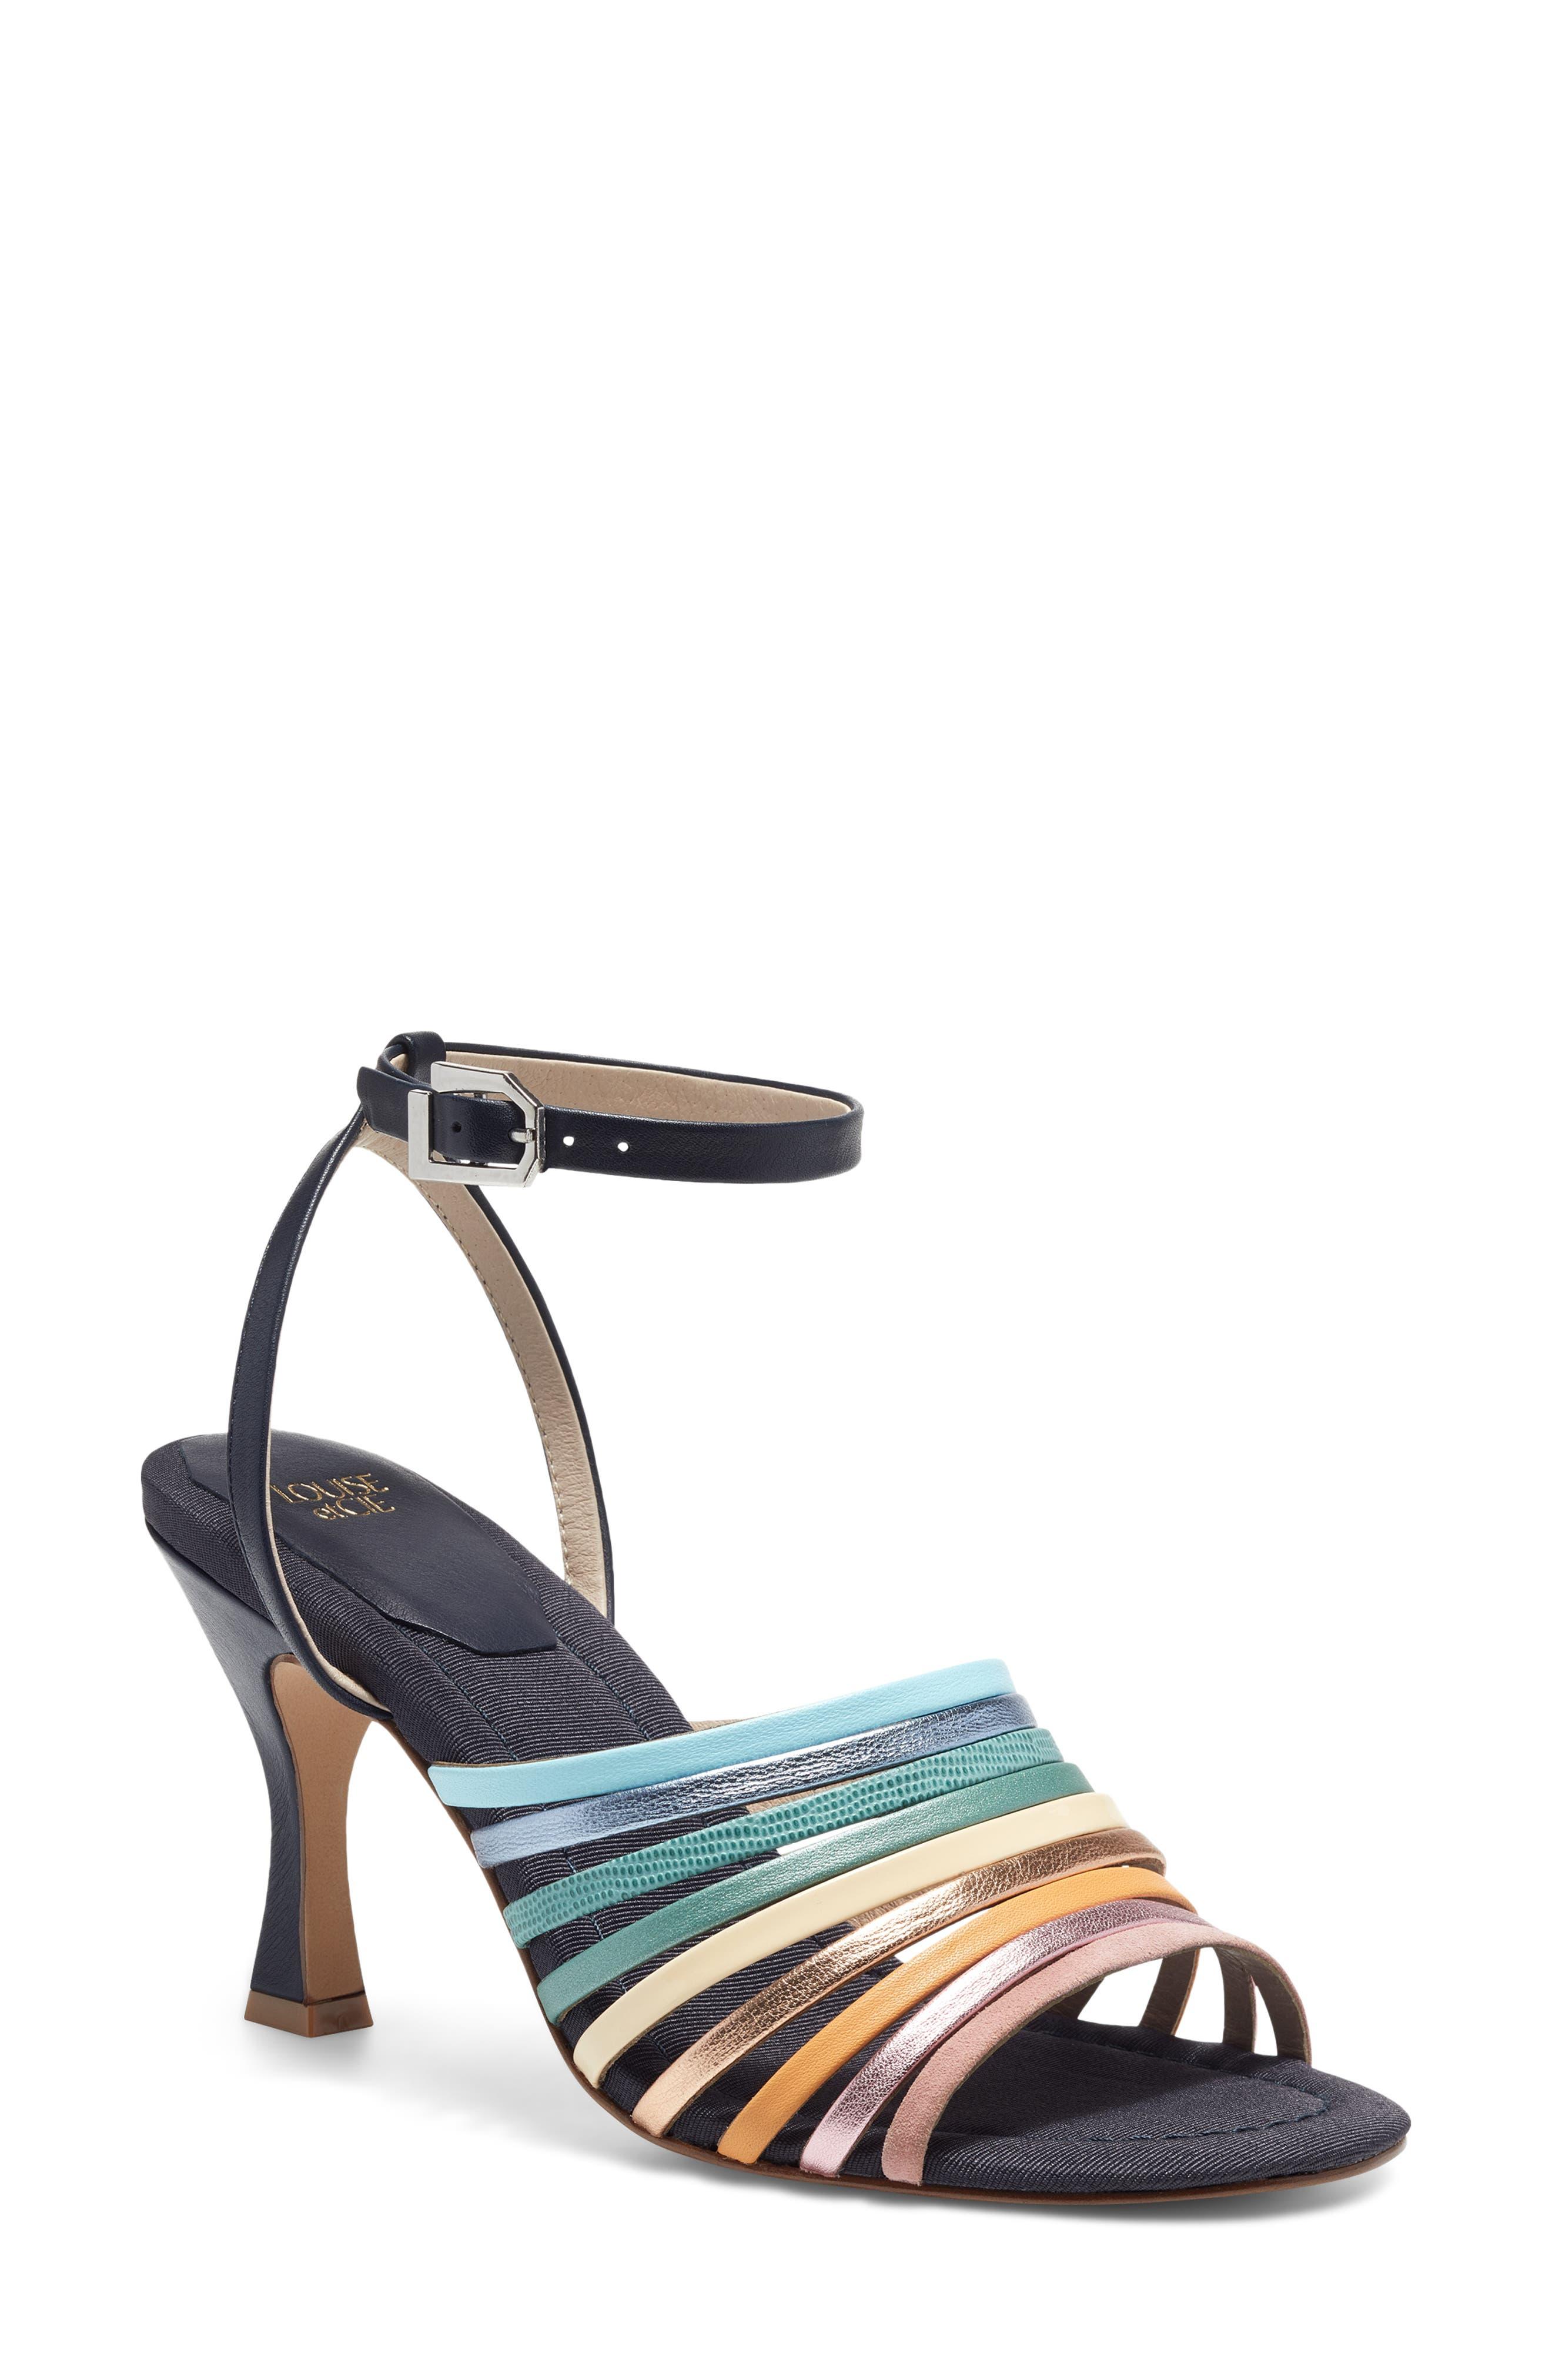 Hilree Ankle Strap Sandal